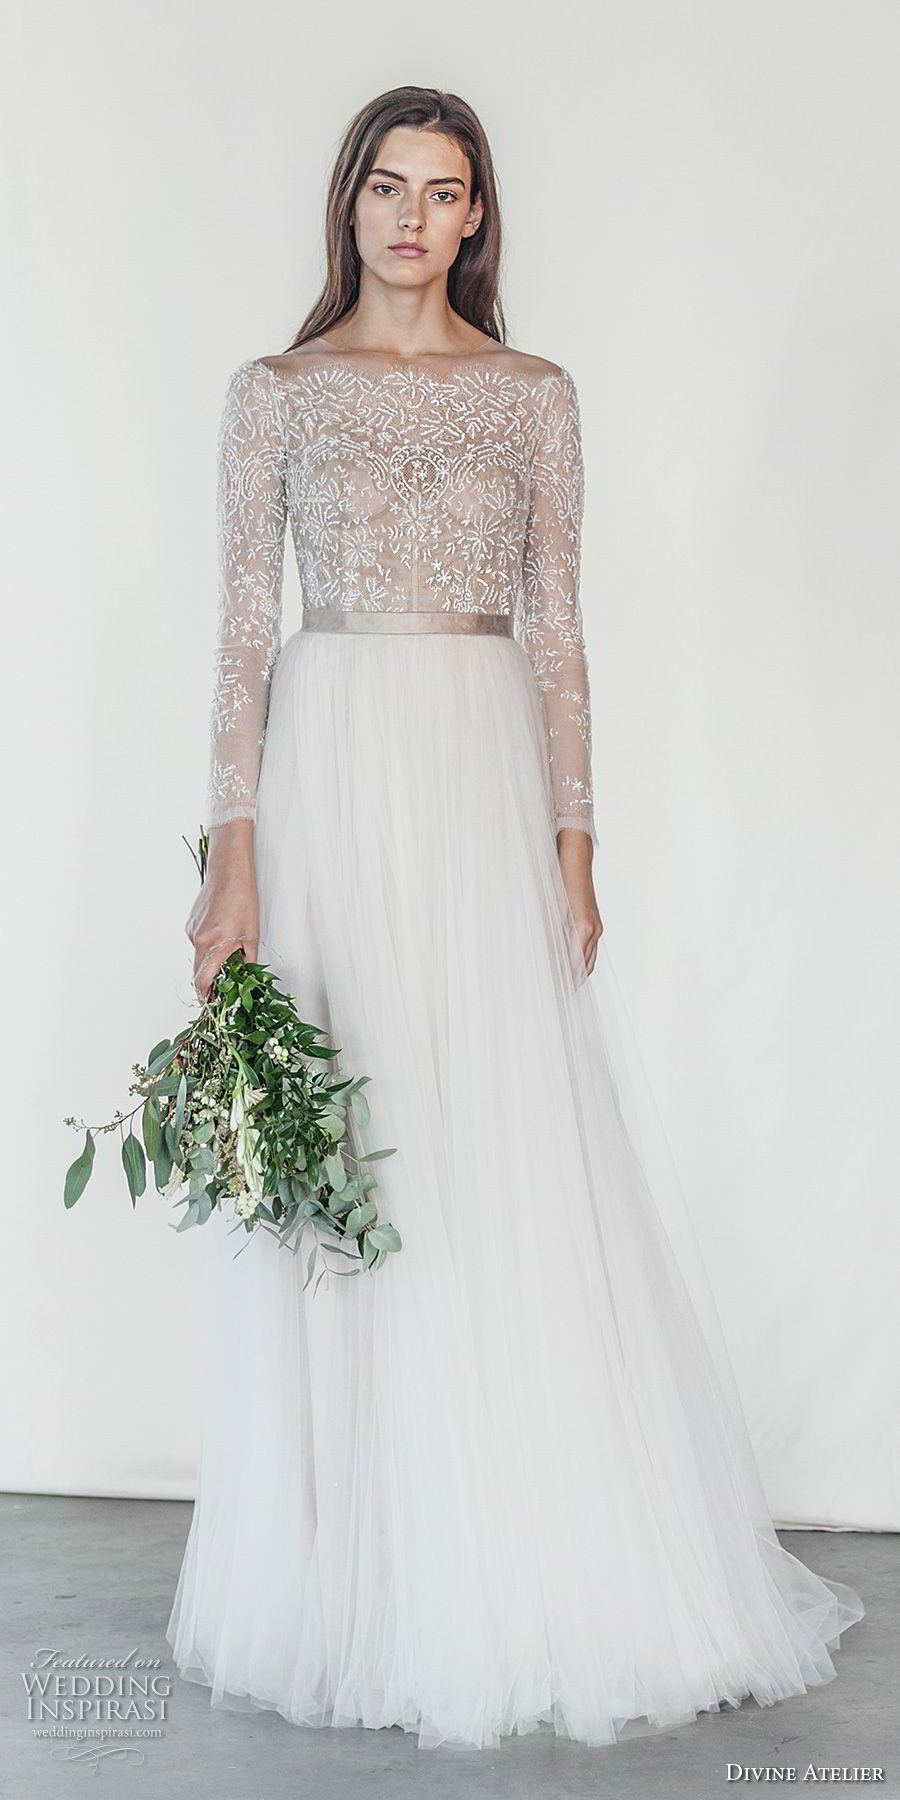 Royal Blue Chiffon Long Prom Dresses With Rhinestone